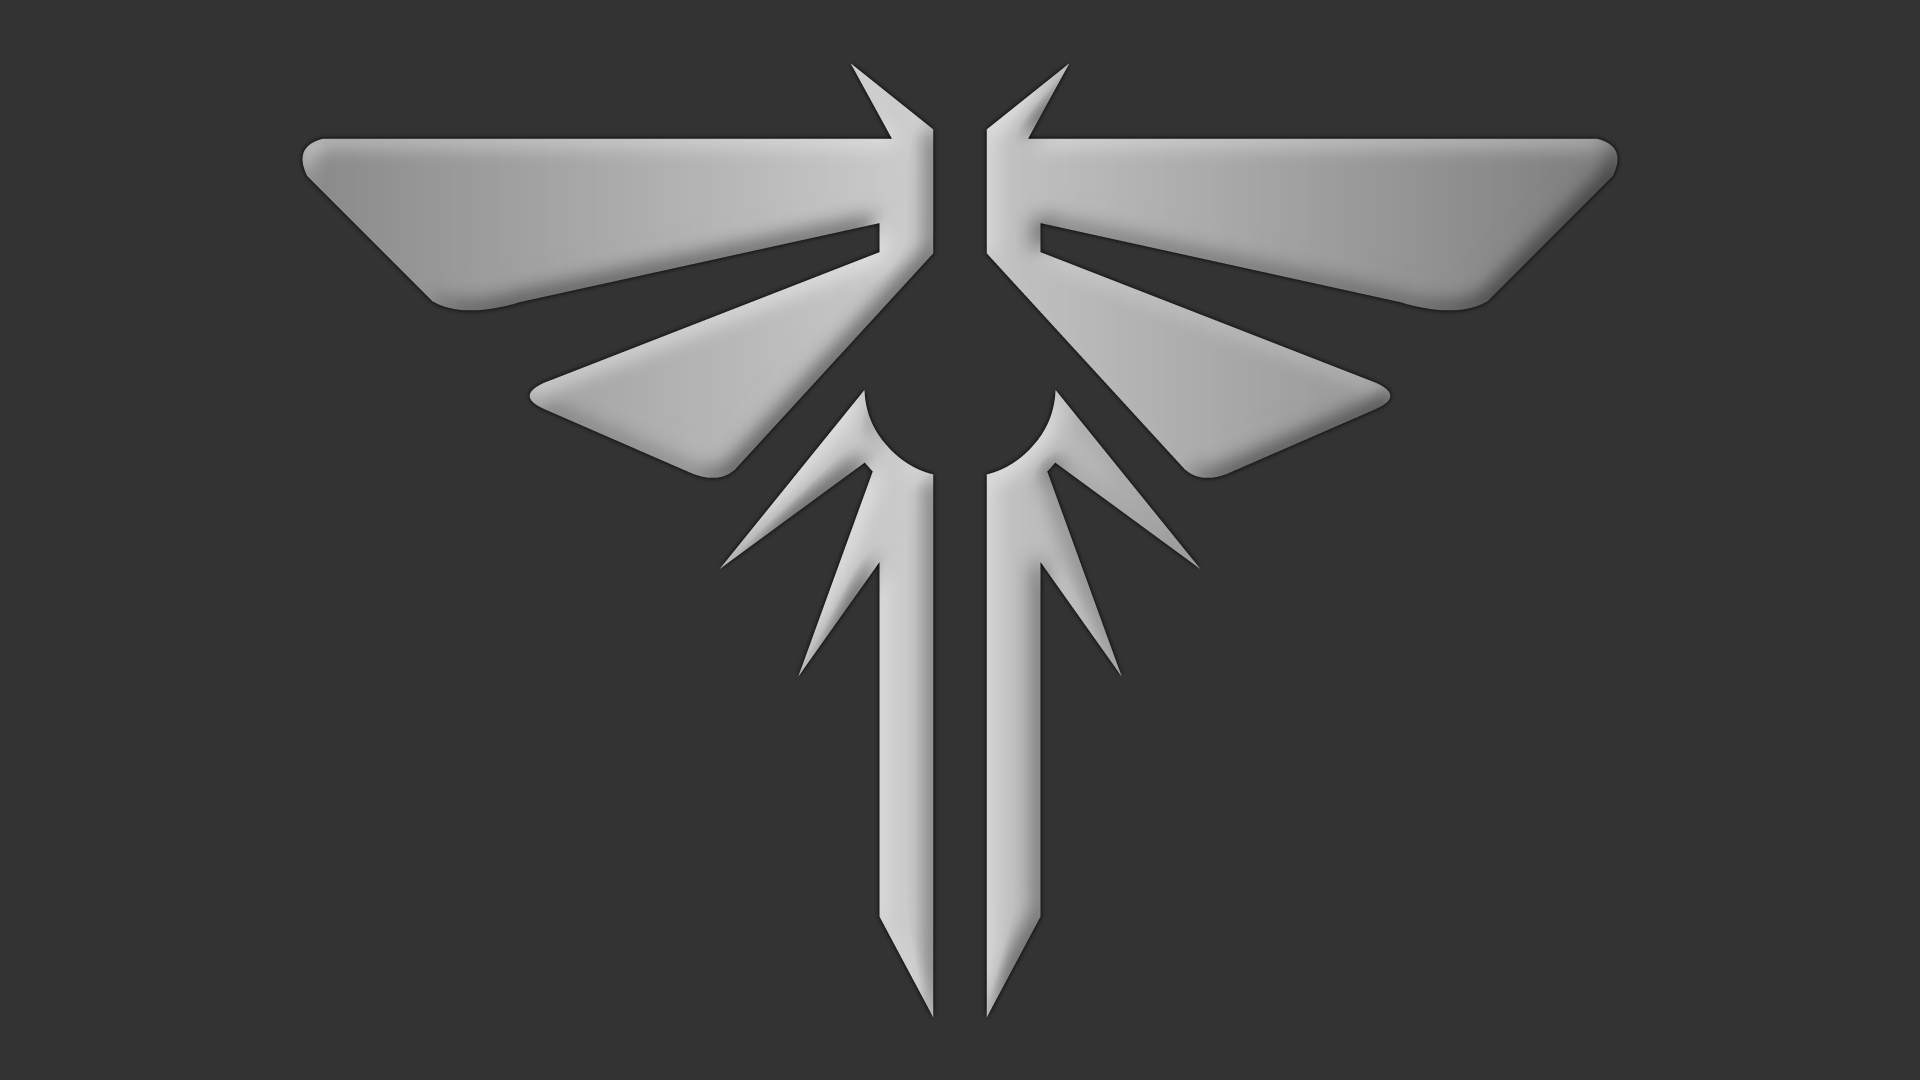 The Last Of Us Symbol By Yurtigo On Deviantart